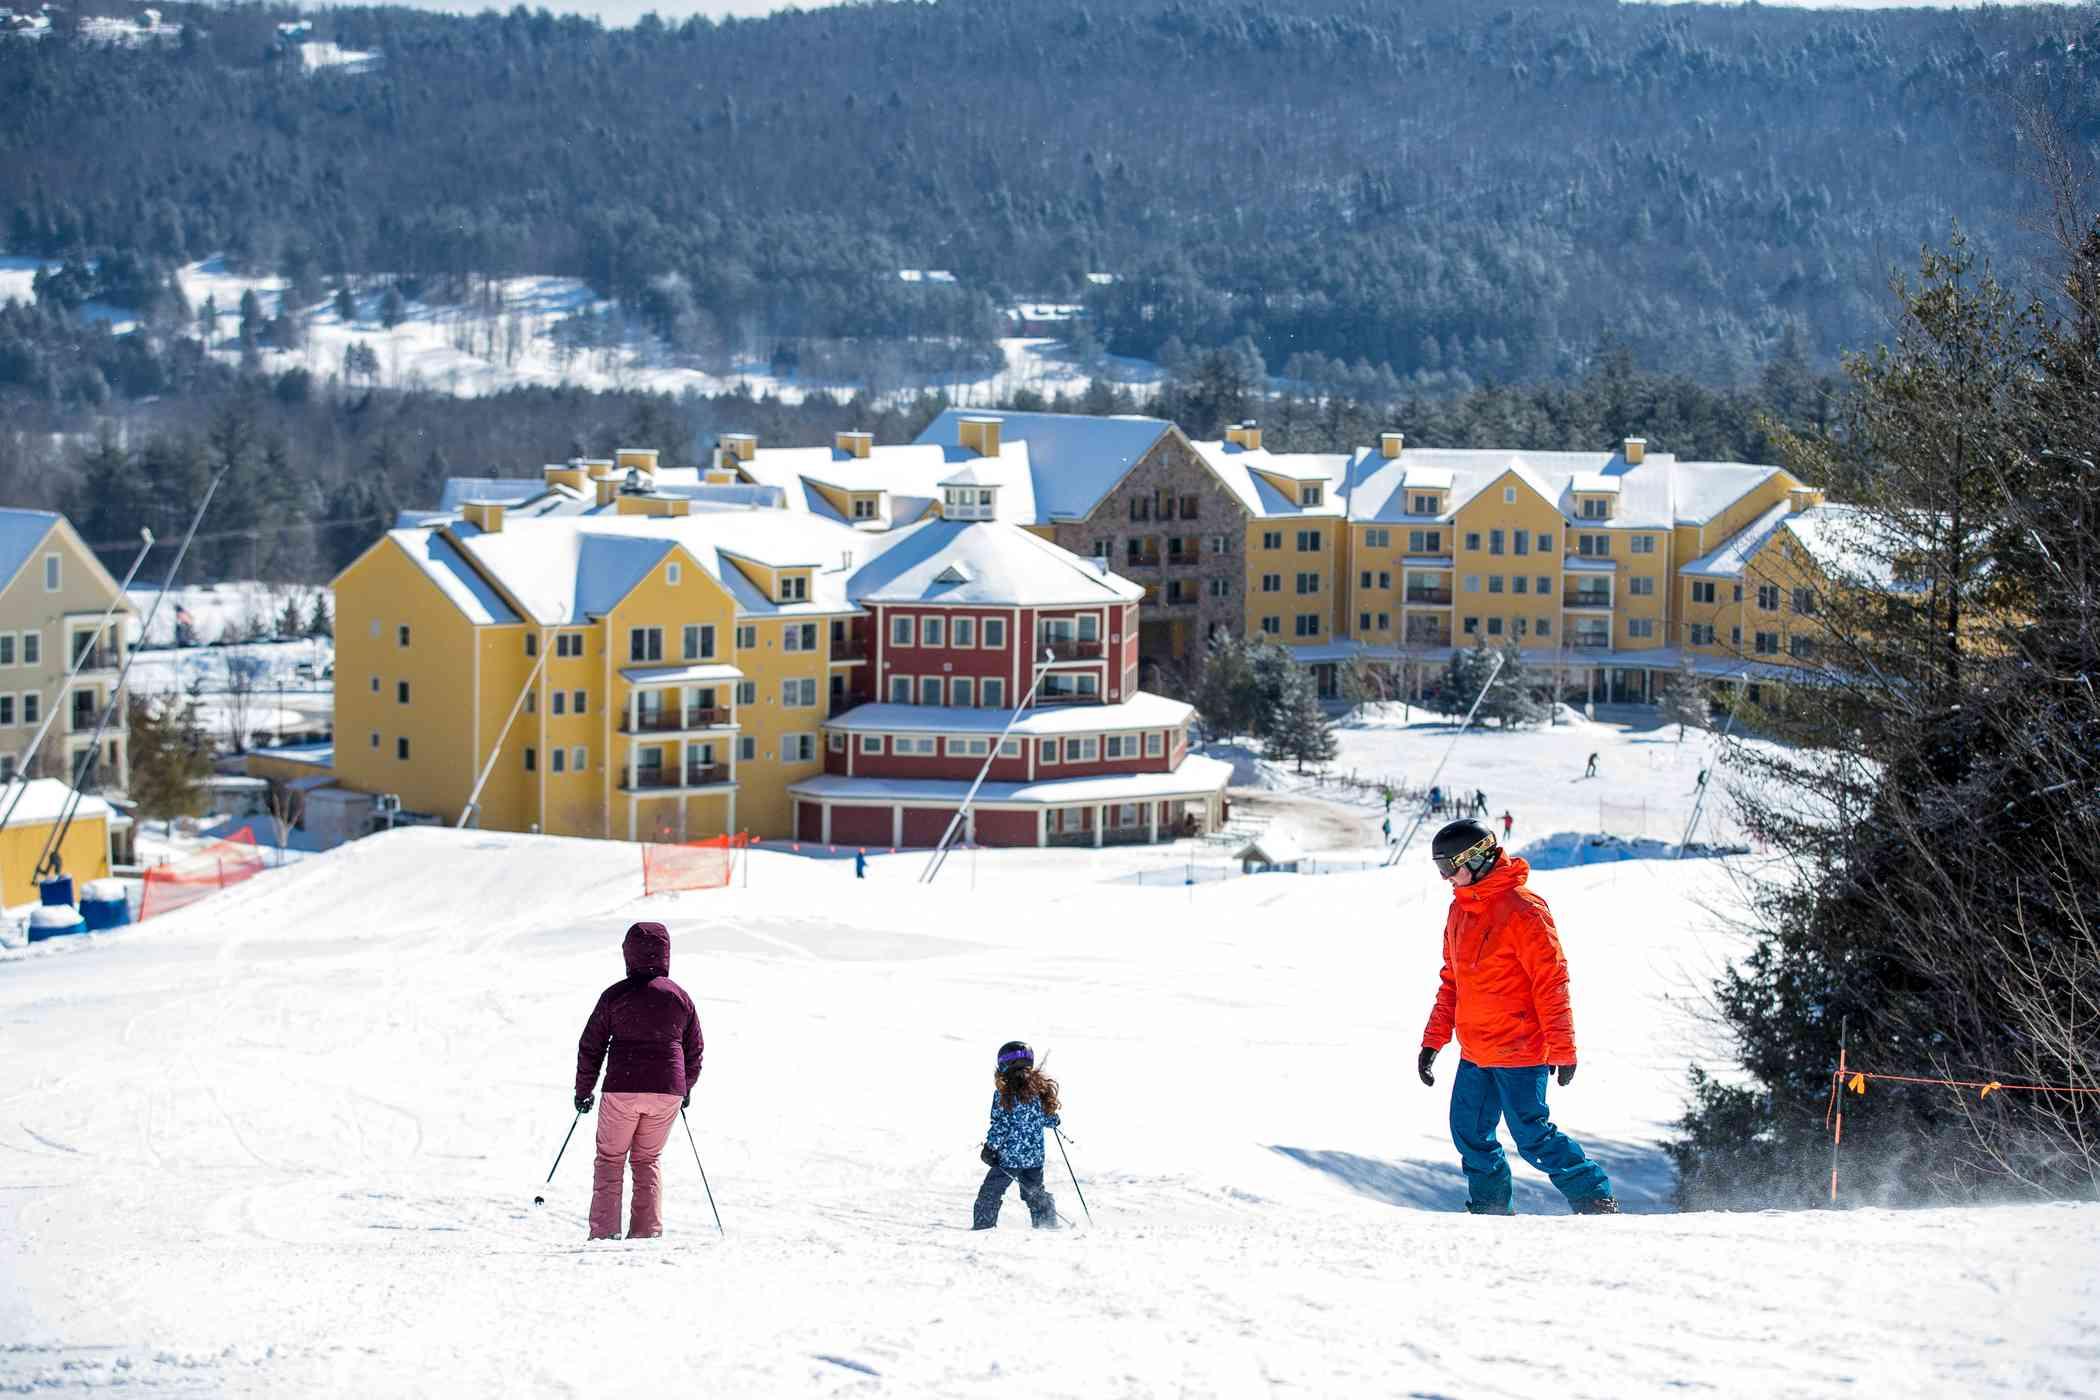 Okemo Mountain a Vail Resorts Ski Area in Vermont